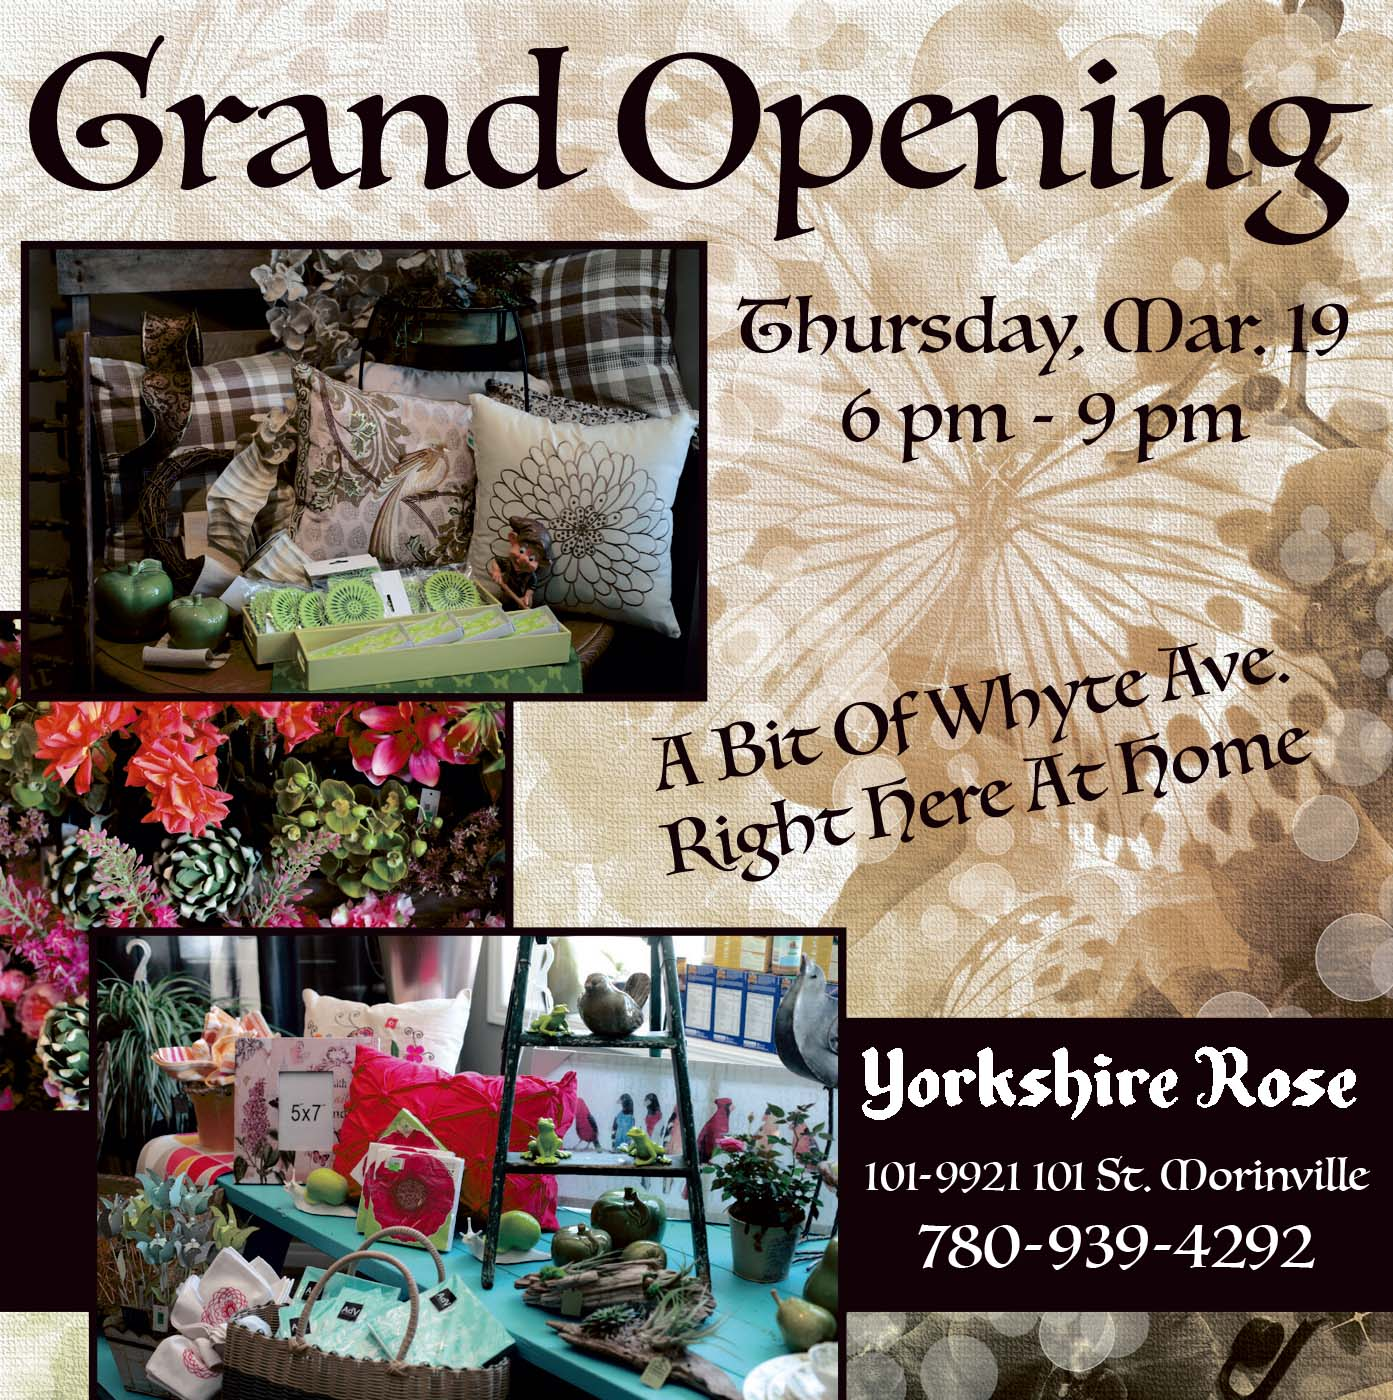 yorkshire opening